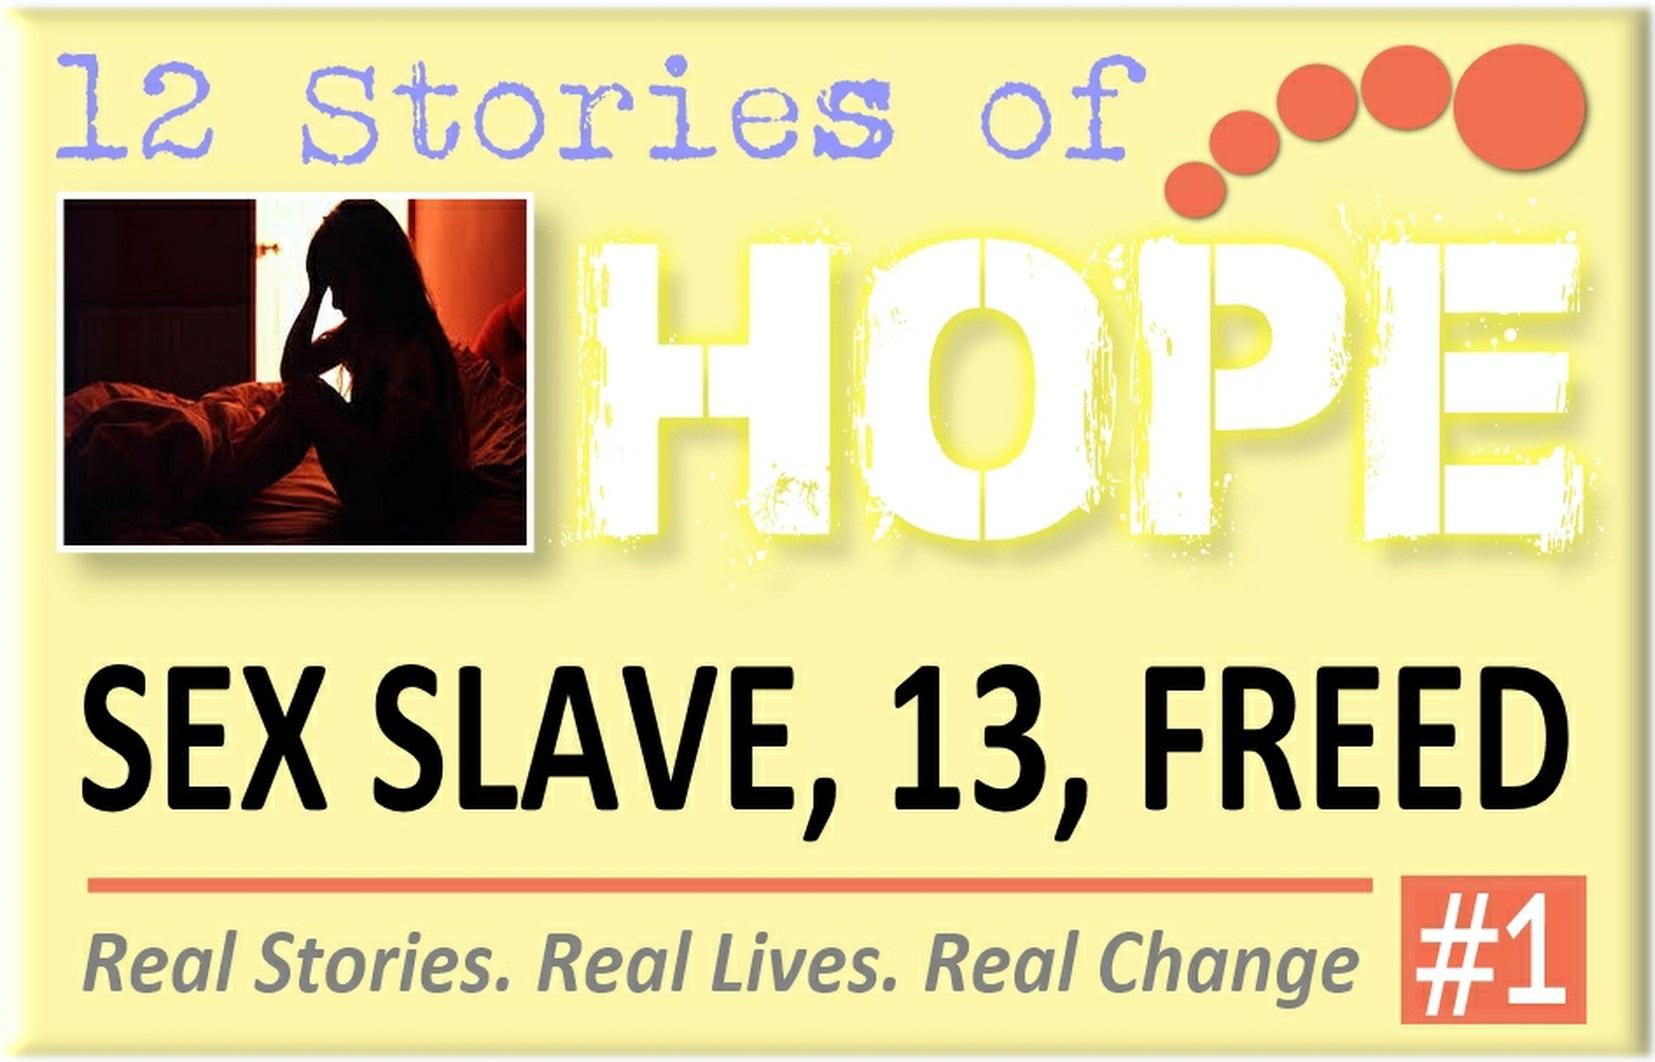 1 Sex slave freed.jpg